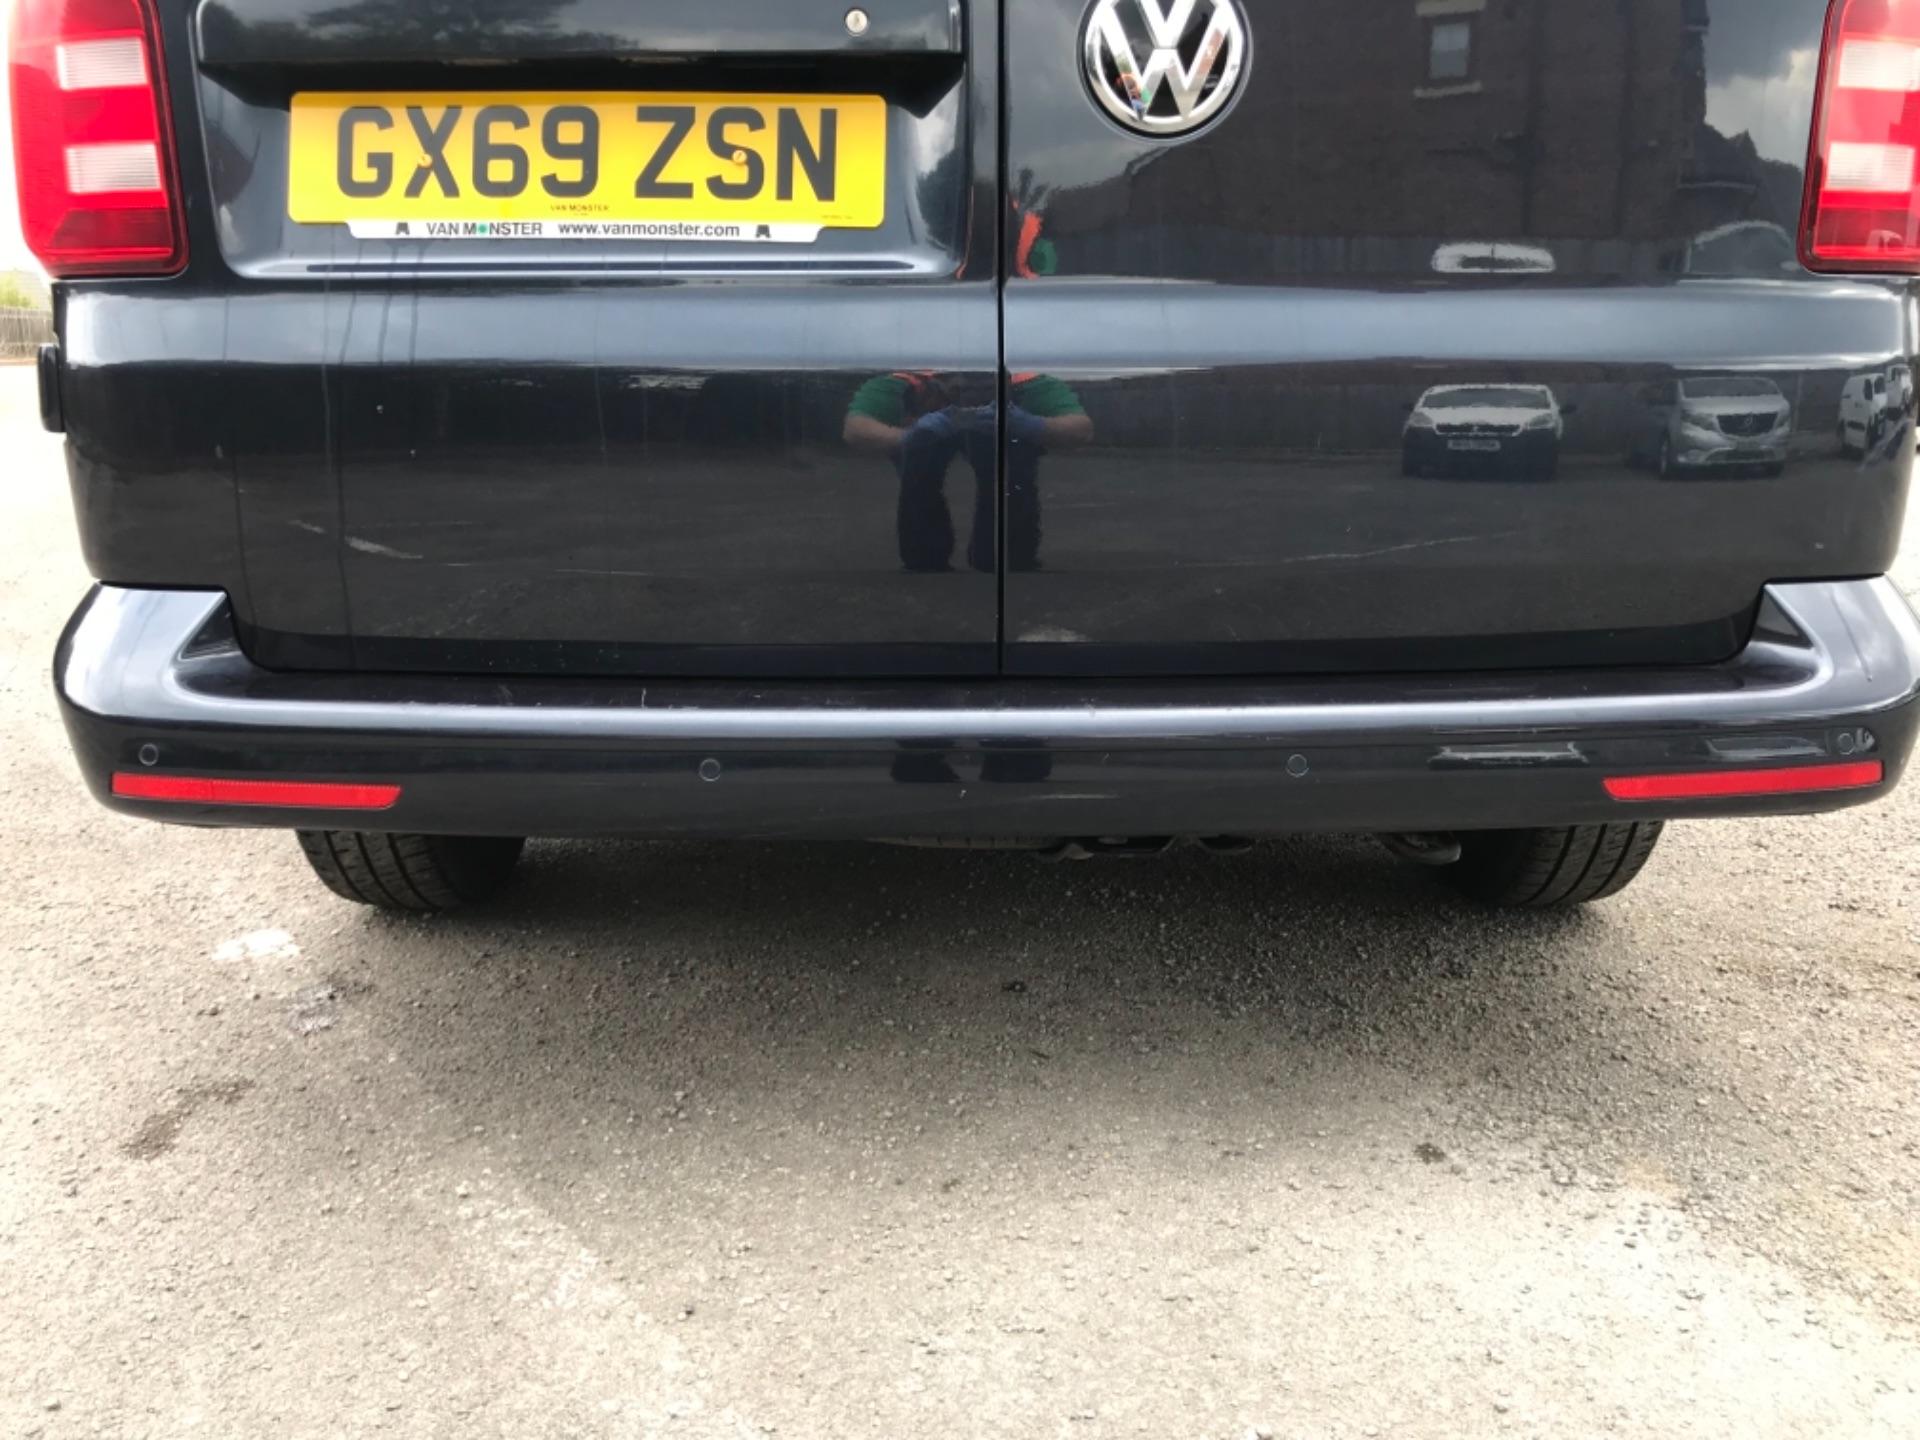 2019 Volkswagen Transporter 2.0 Tdi Bmt 150 Highline Van EURO 6 (GX69ZSN) Image 40